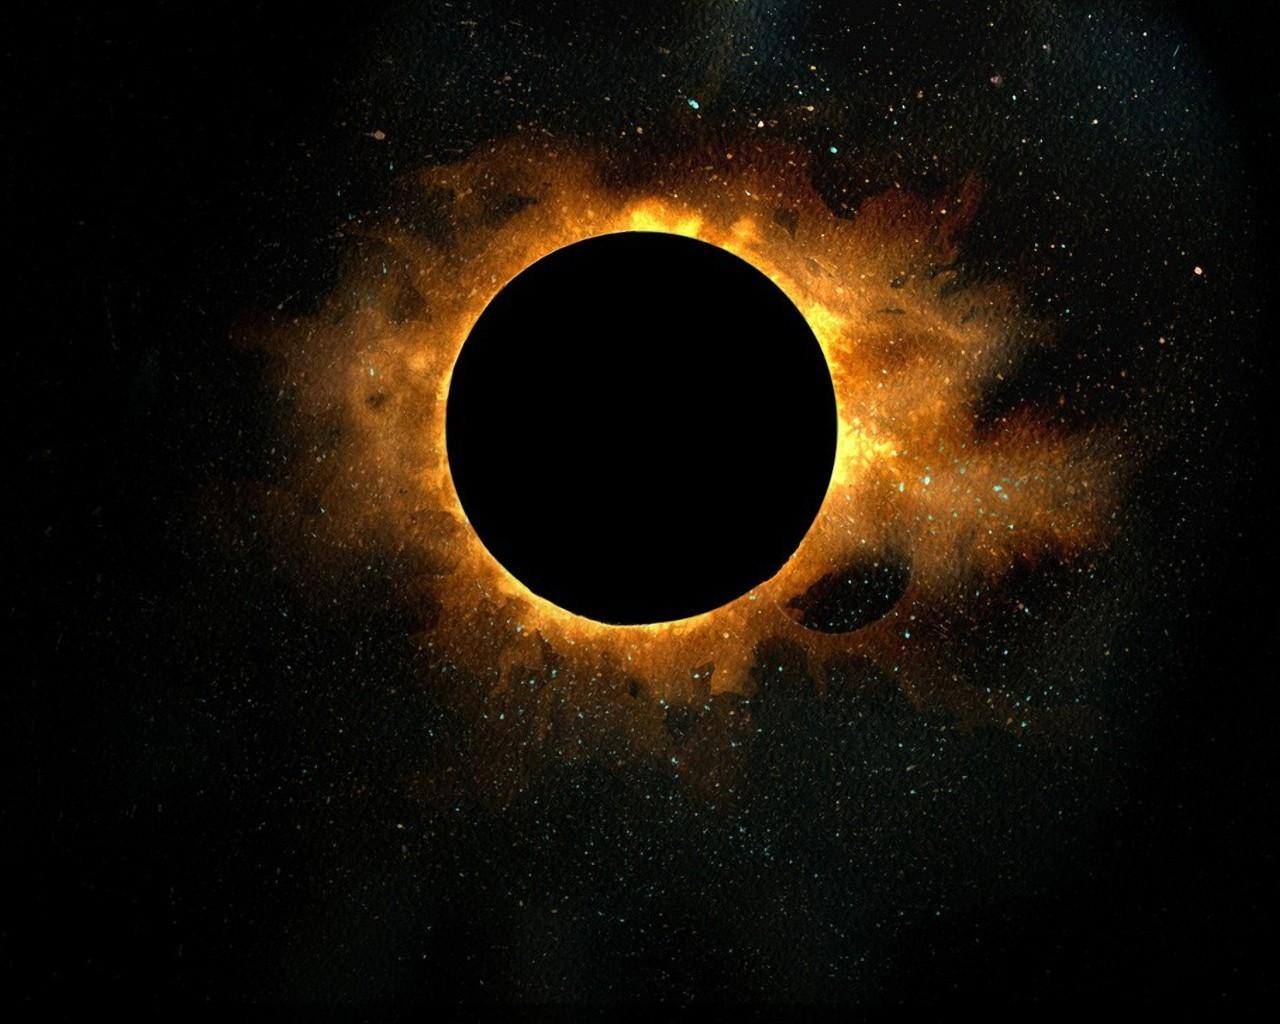 solar eclipse August 2017 3 stars